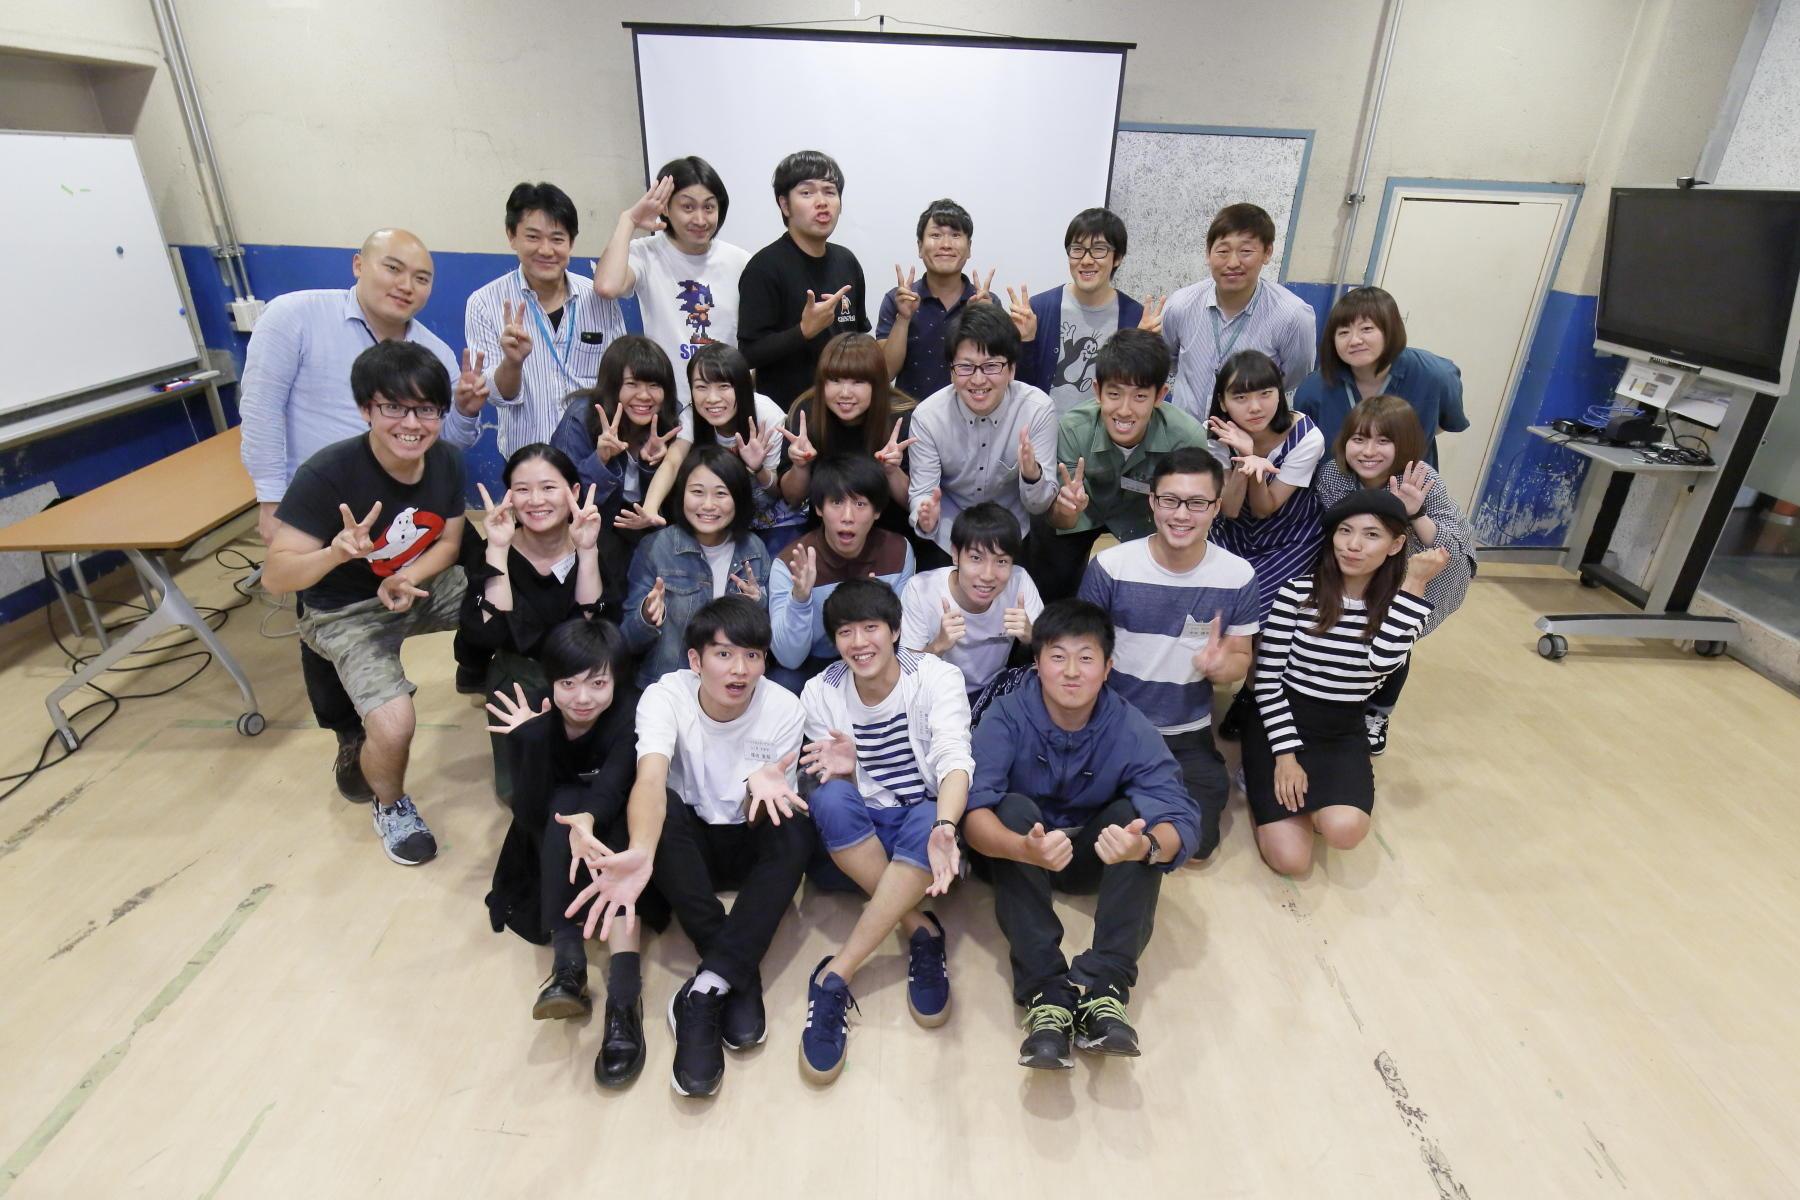 http://news.yoshimoto.co.jp/20171010200544-18392bfb97a94efd3e76d99ff67c3b2c104f19f1.jpg